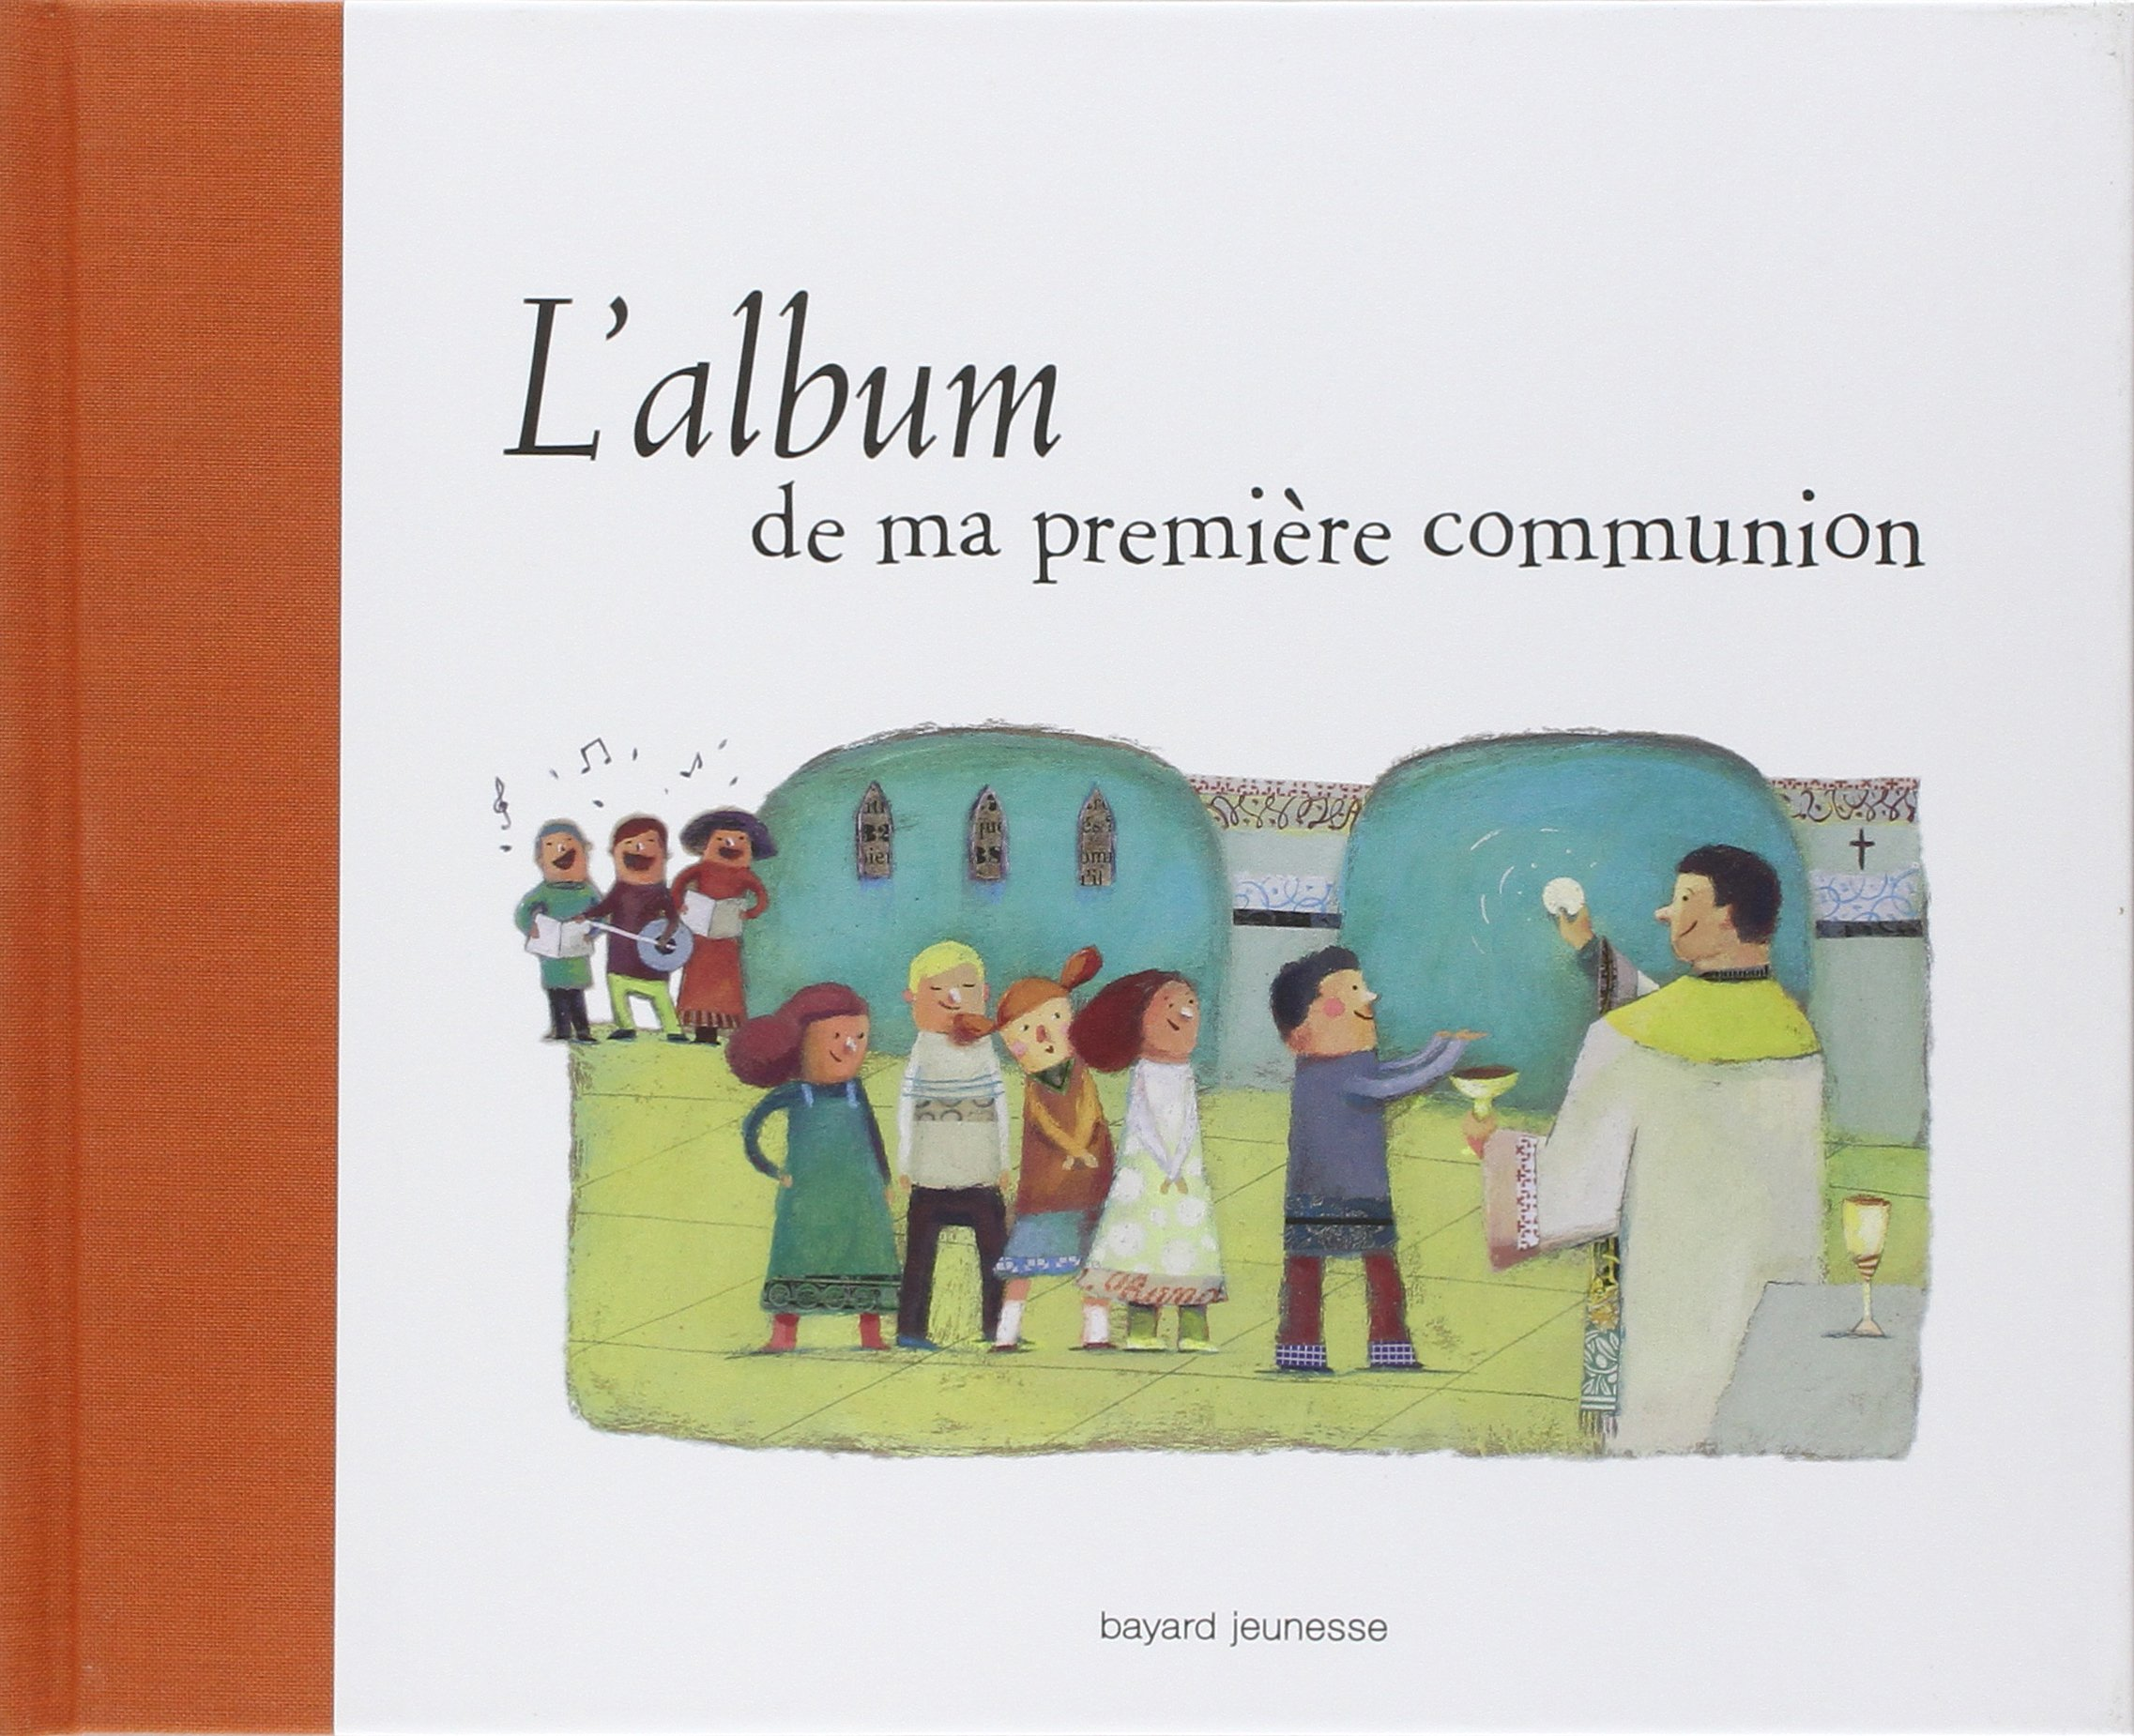 Album de ma communion Album – 15 mars 2004 Caroline Pellissier Virginie Aladjidi Bayard 2747013057